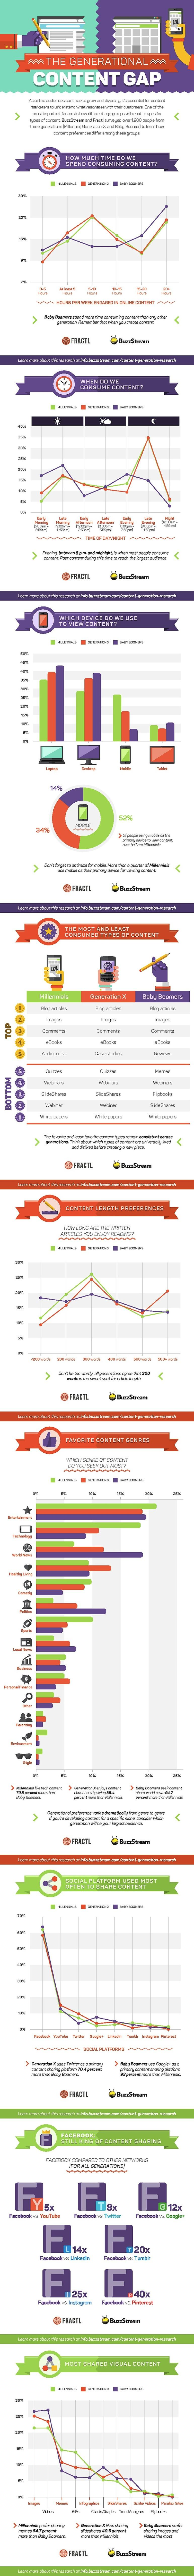 content-engagement-generation-infographic-blog-hostalia-hosting